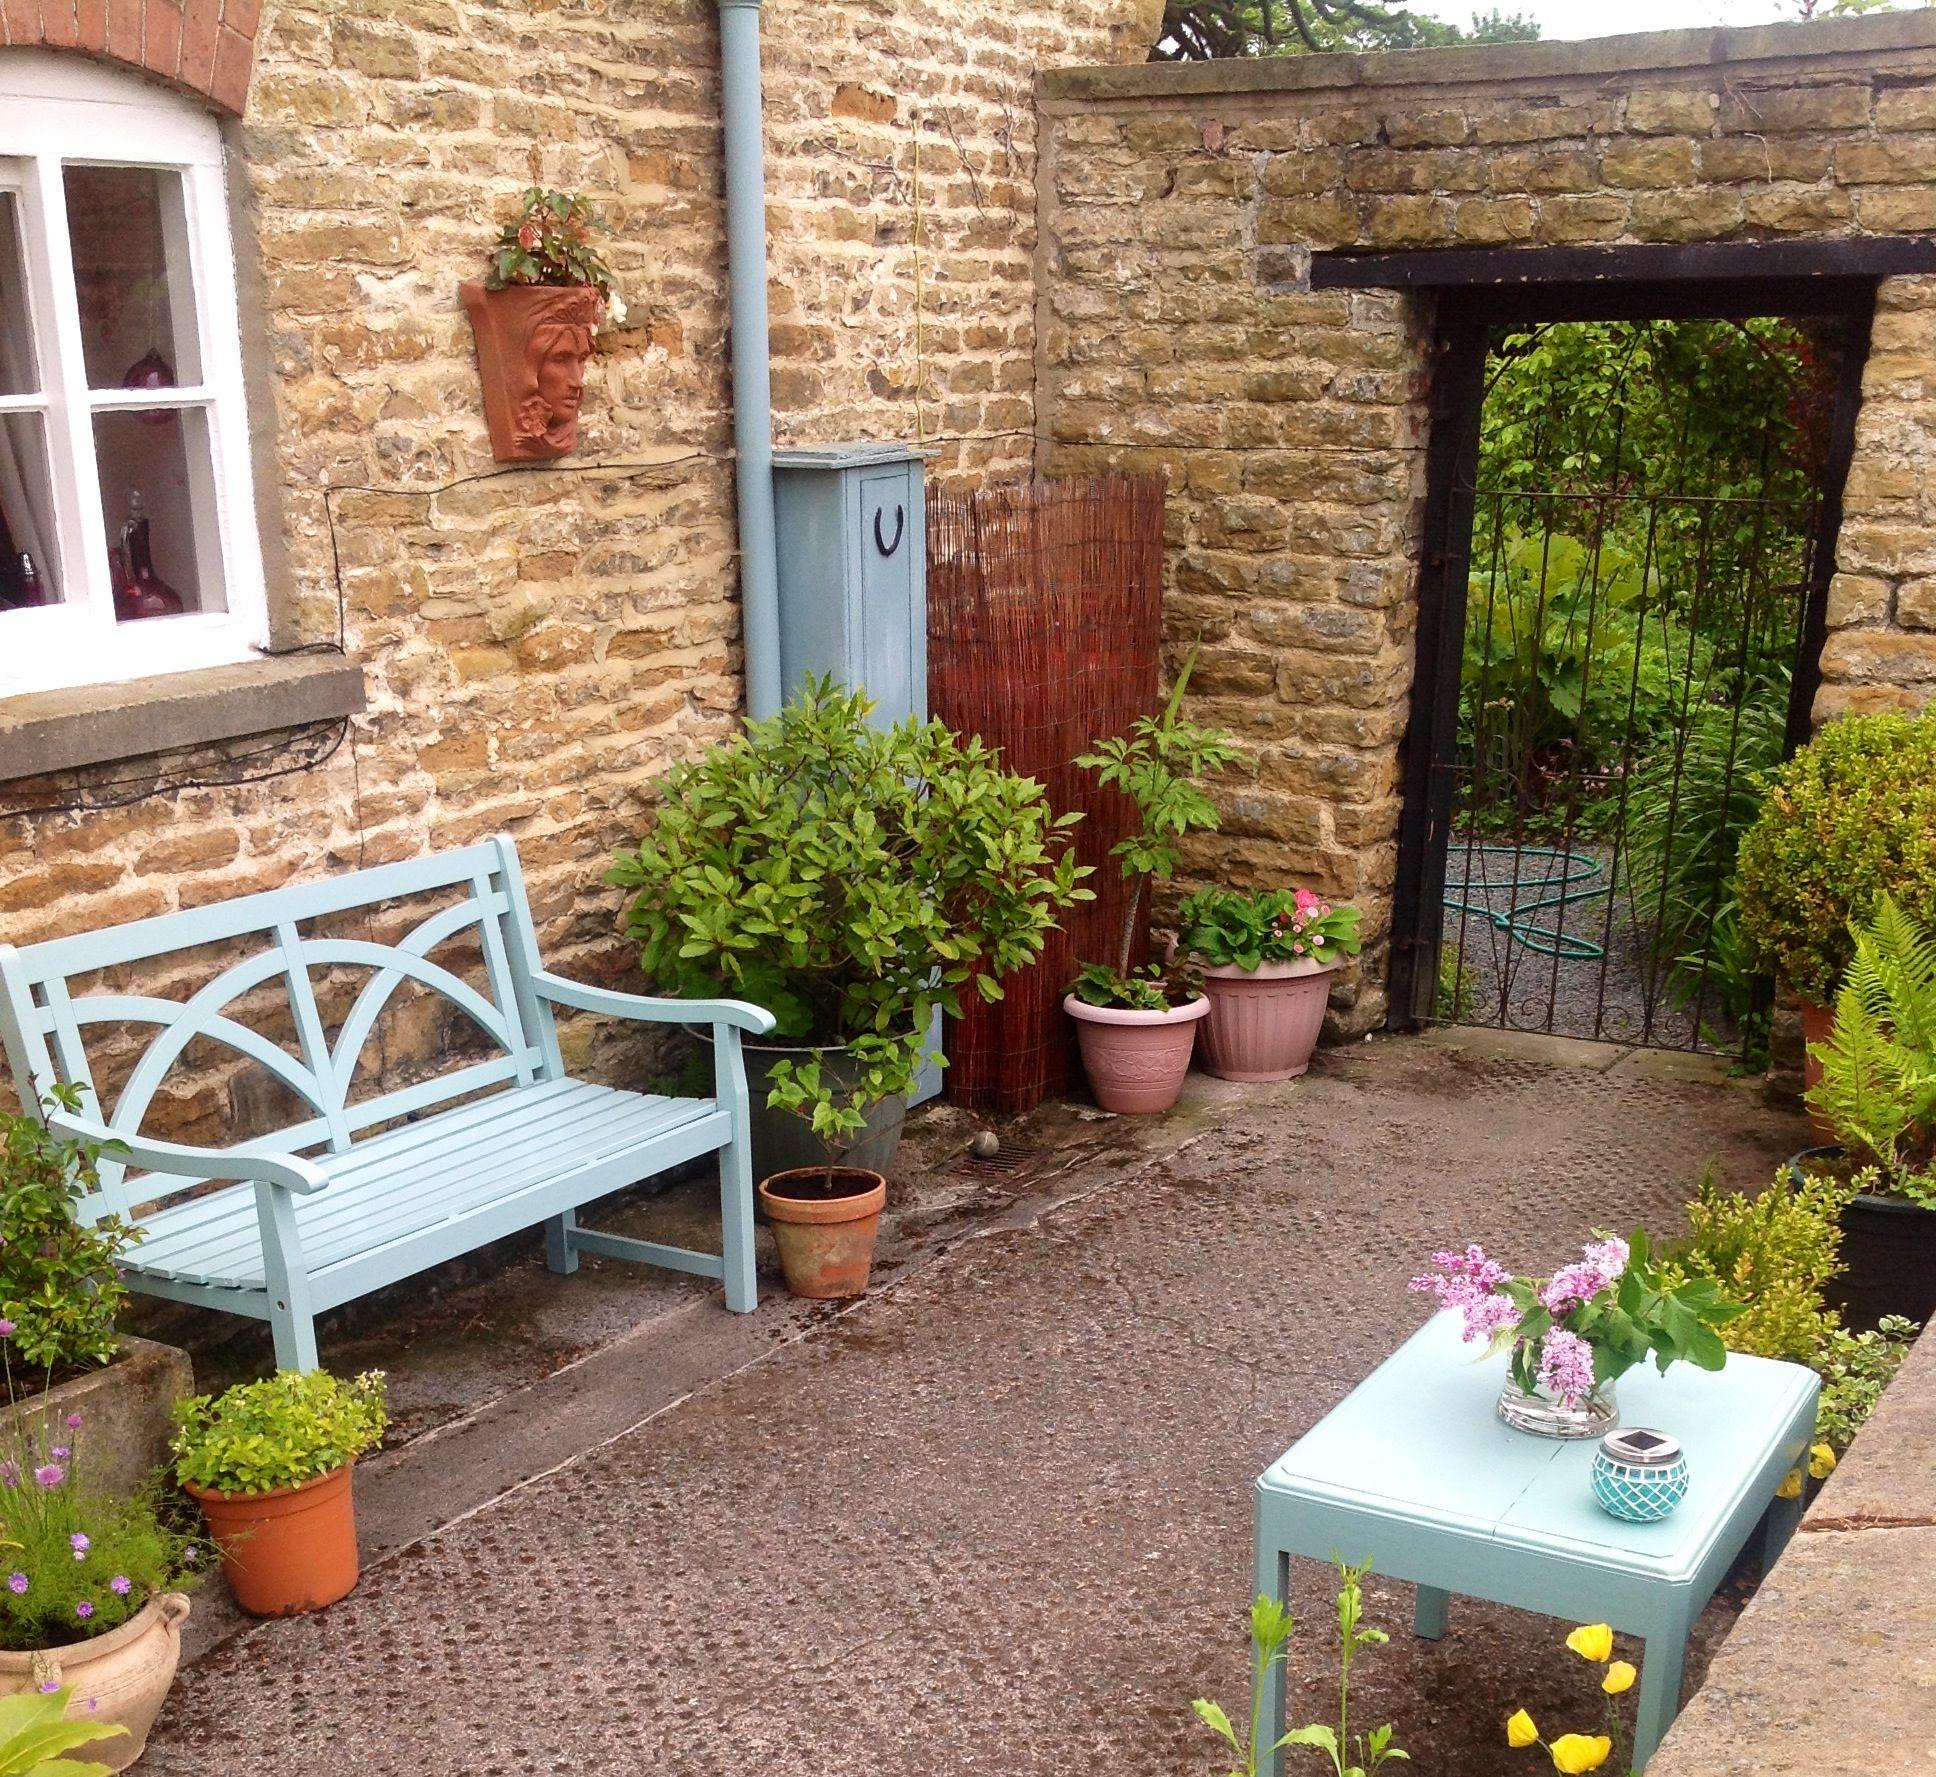 Small walled garden | Courtyard Garden Ideas | Pinterest on Courtyard Patio Ideas id=61230